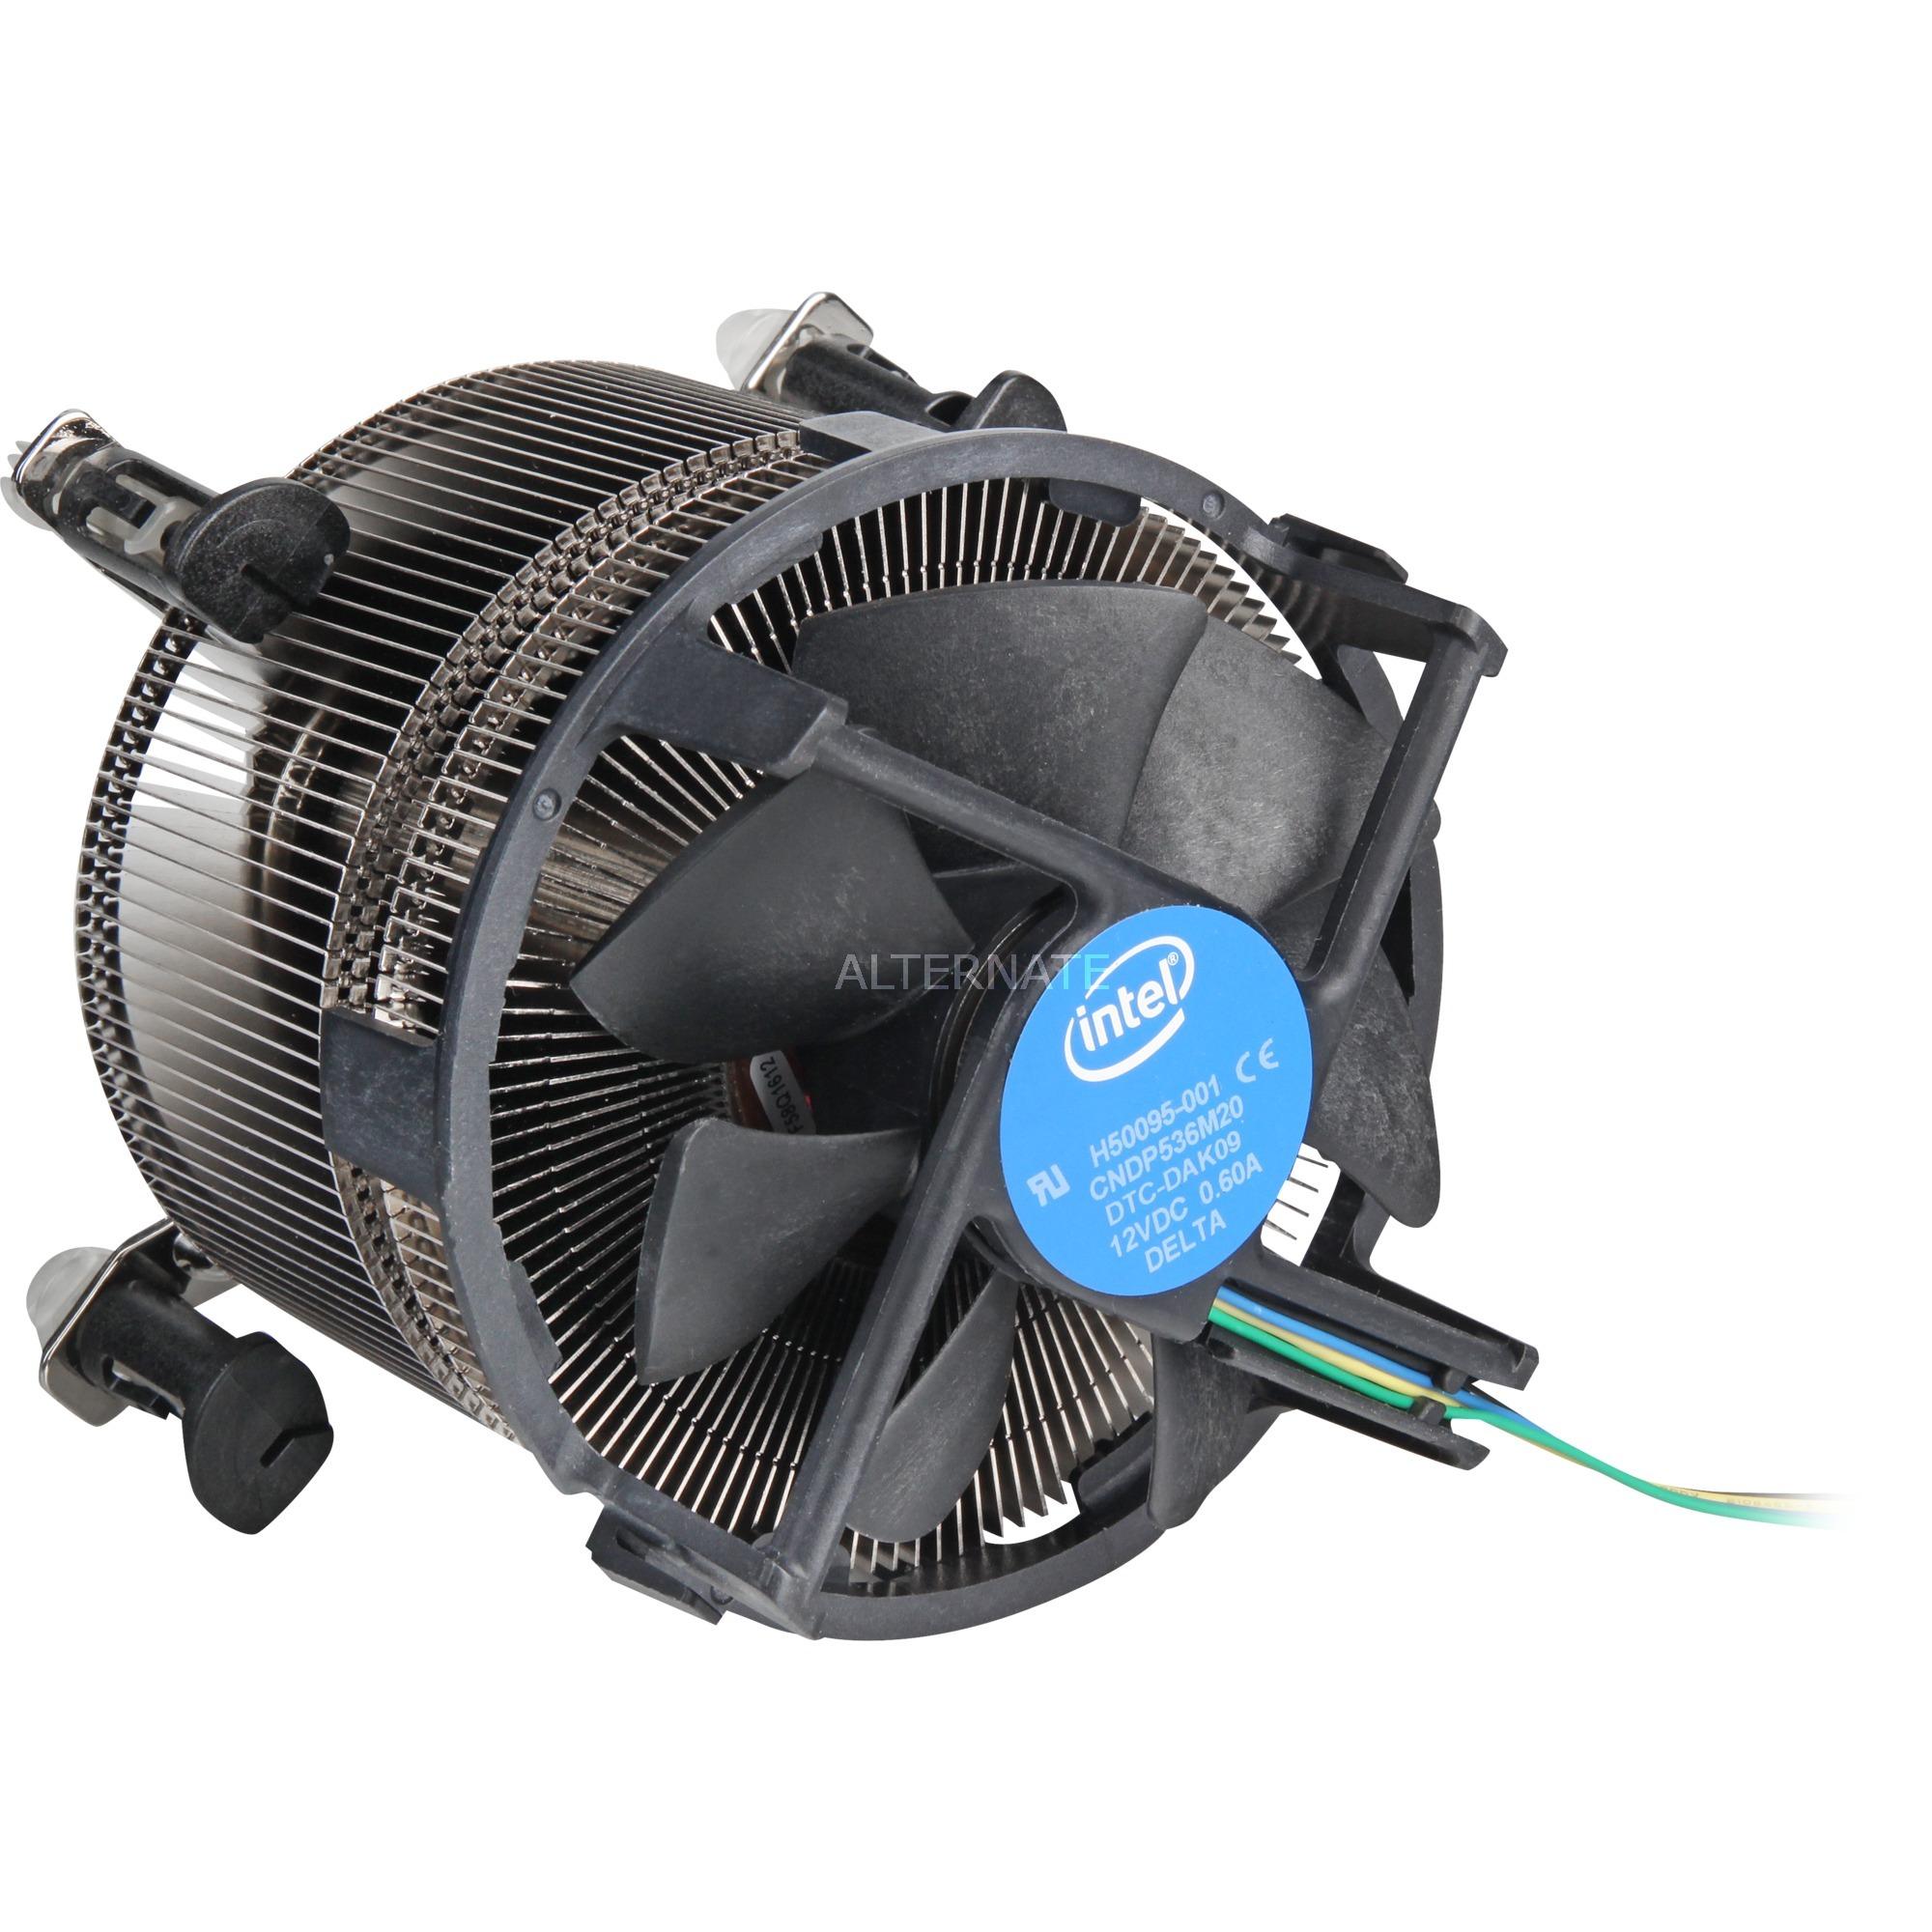 BXTS15A Procesador Enfriador ventilador de PC, Disipador de CPU